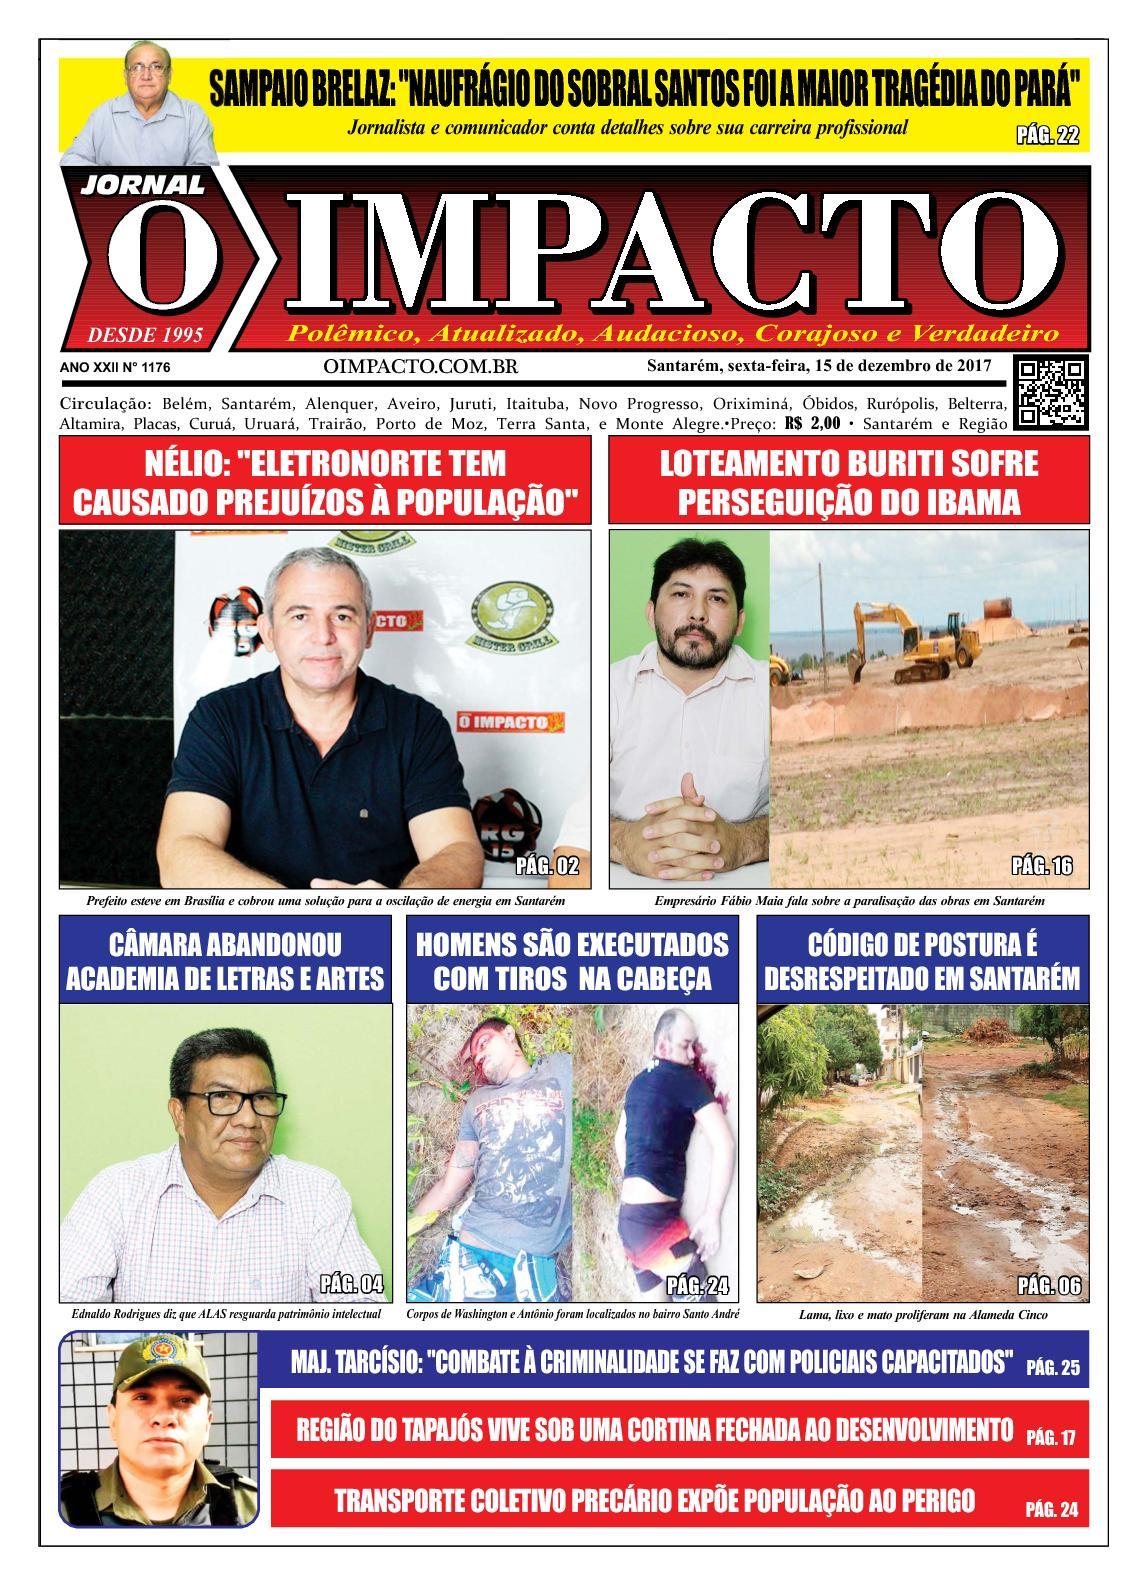 Calaméo - Jornal O Impacto Ed. 1176 e712dede7e569